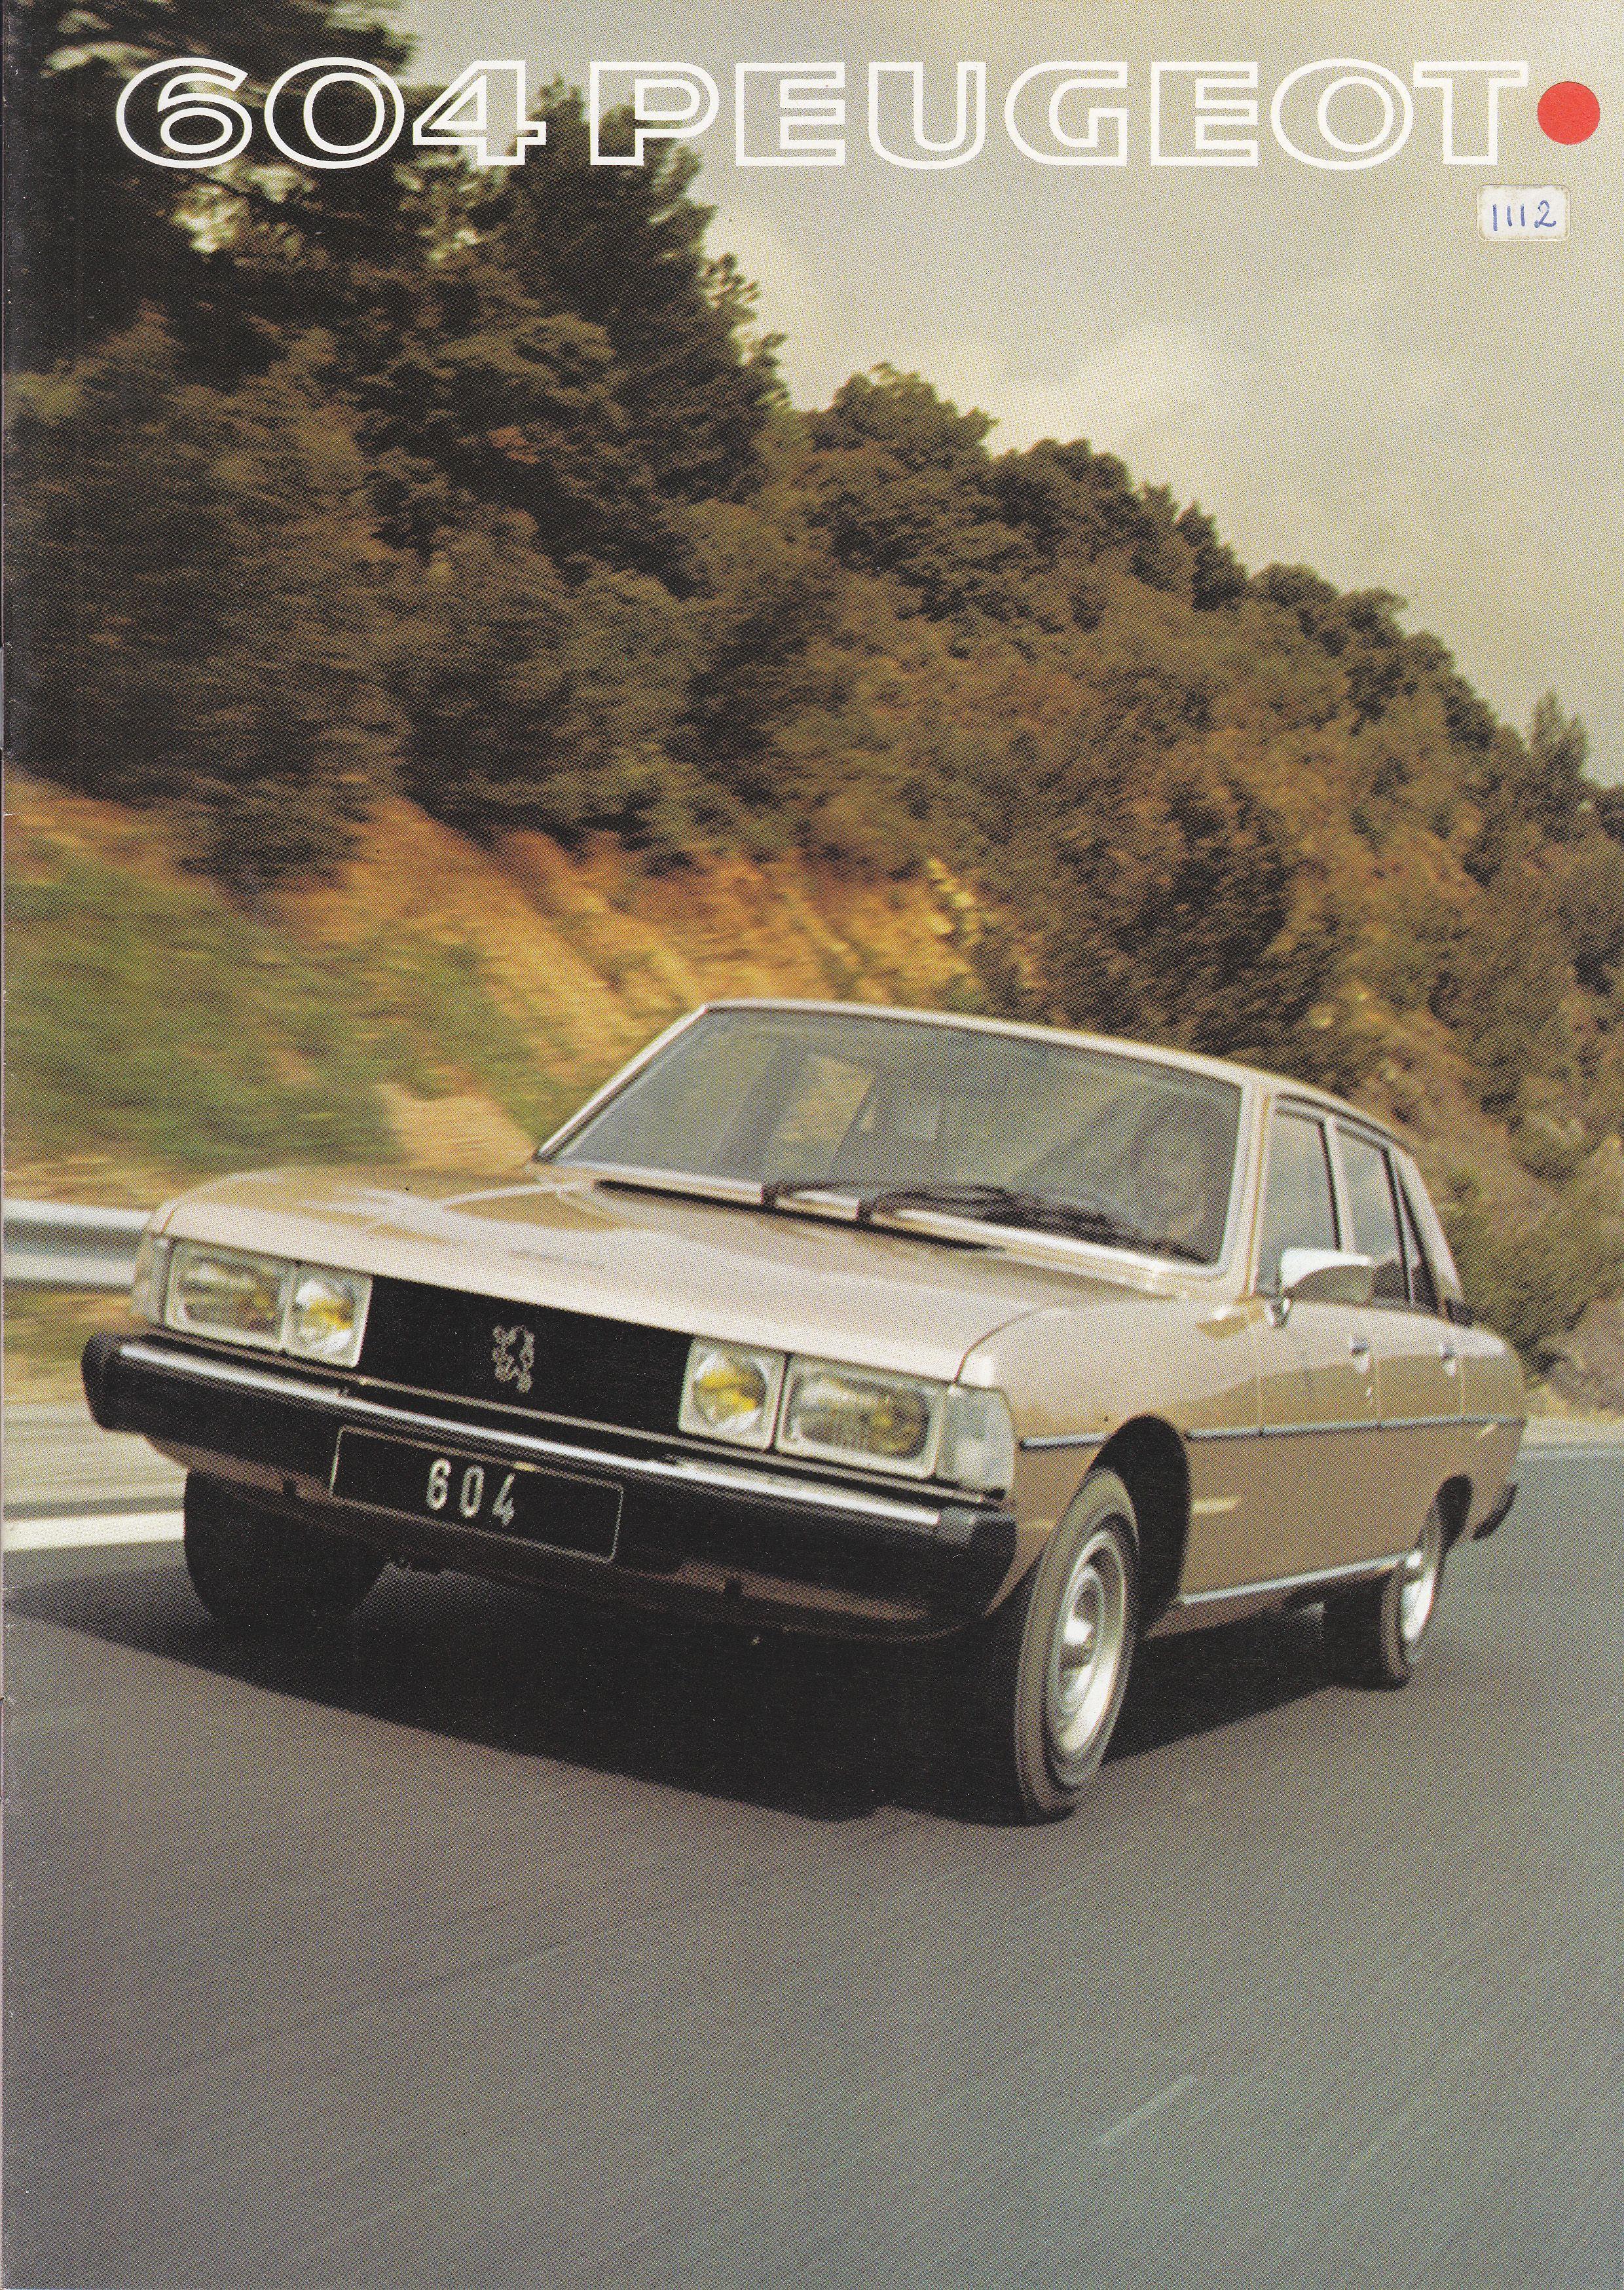 Peugeot 604 Sedan, sales brochure, 1977